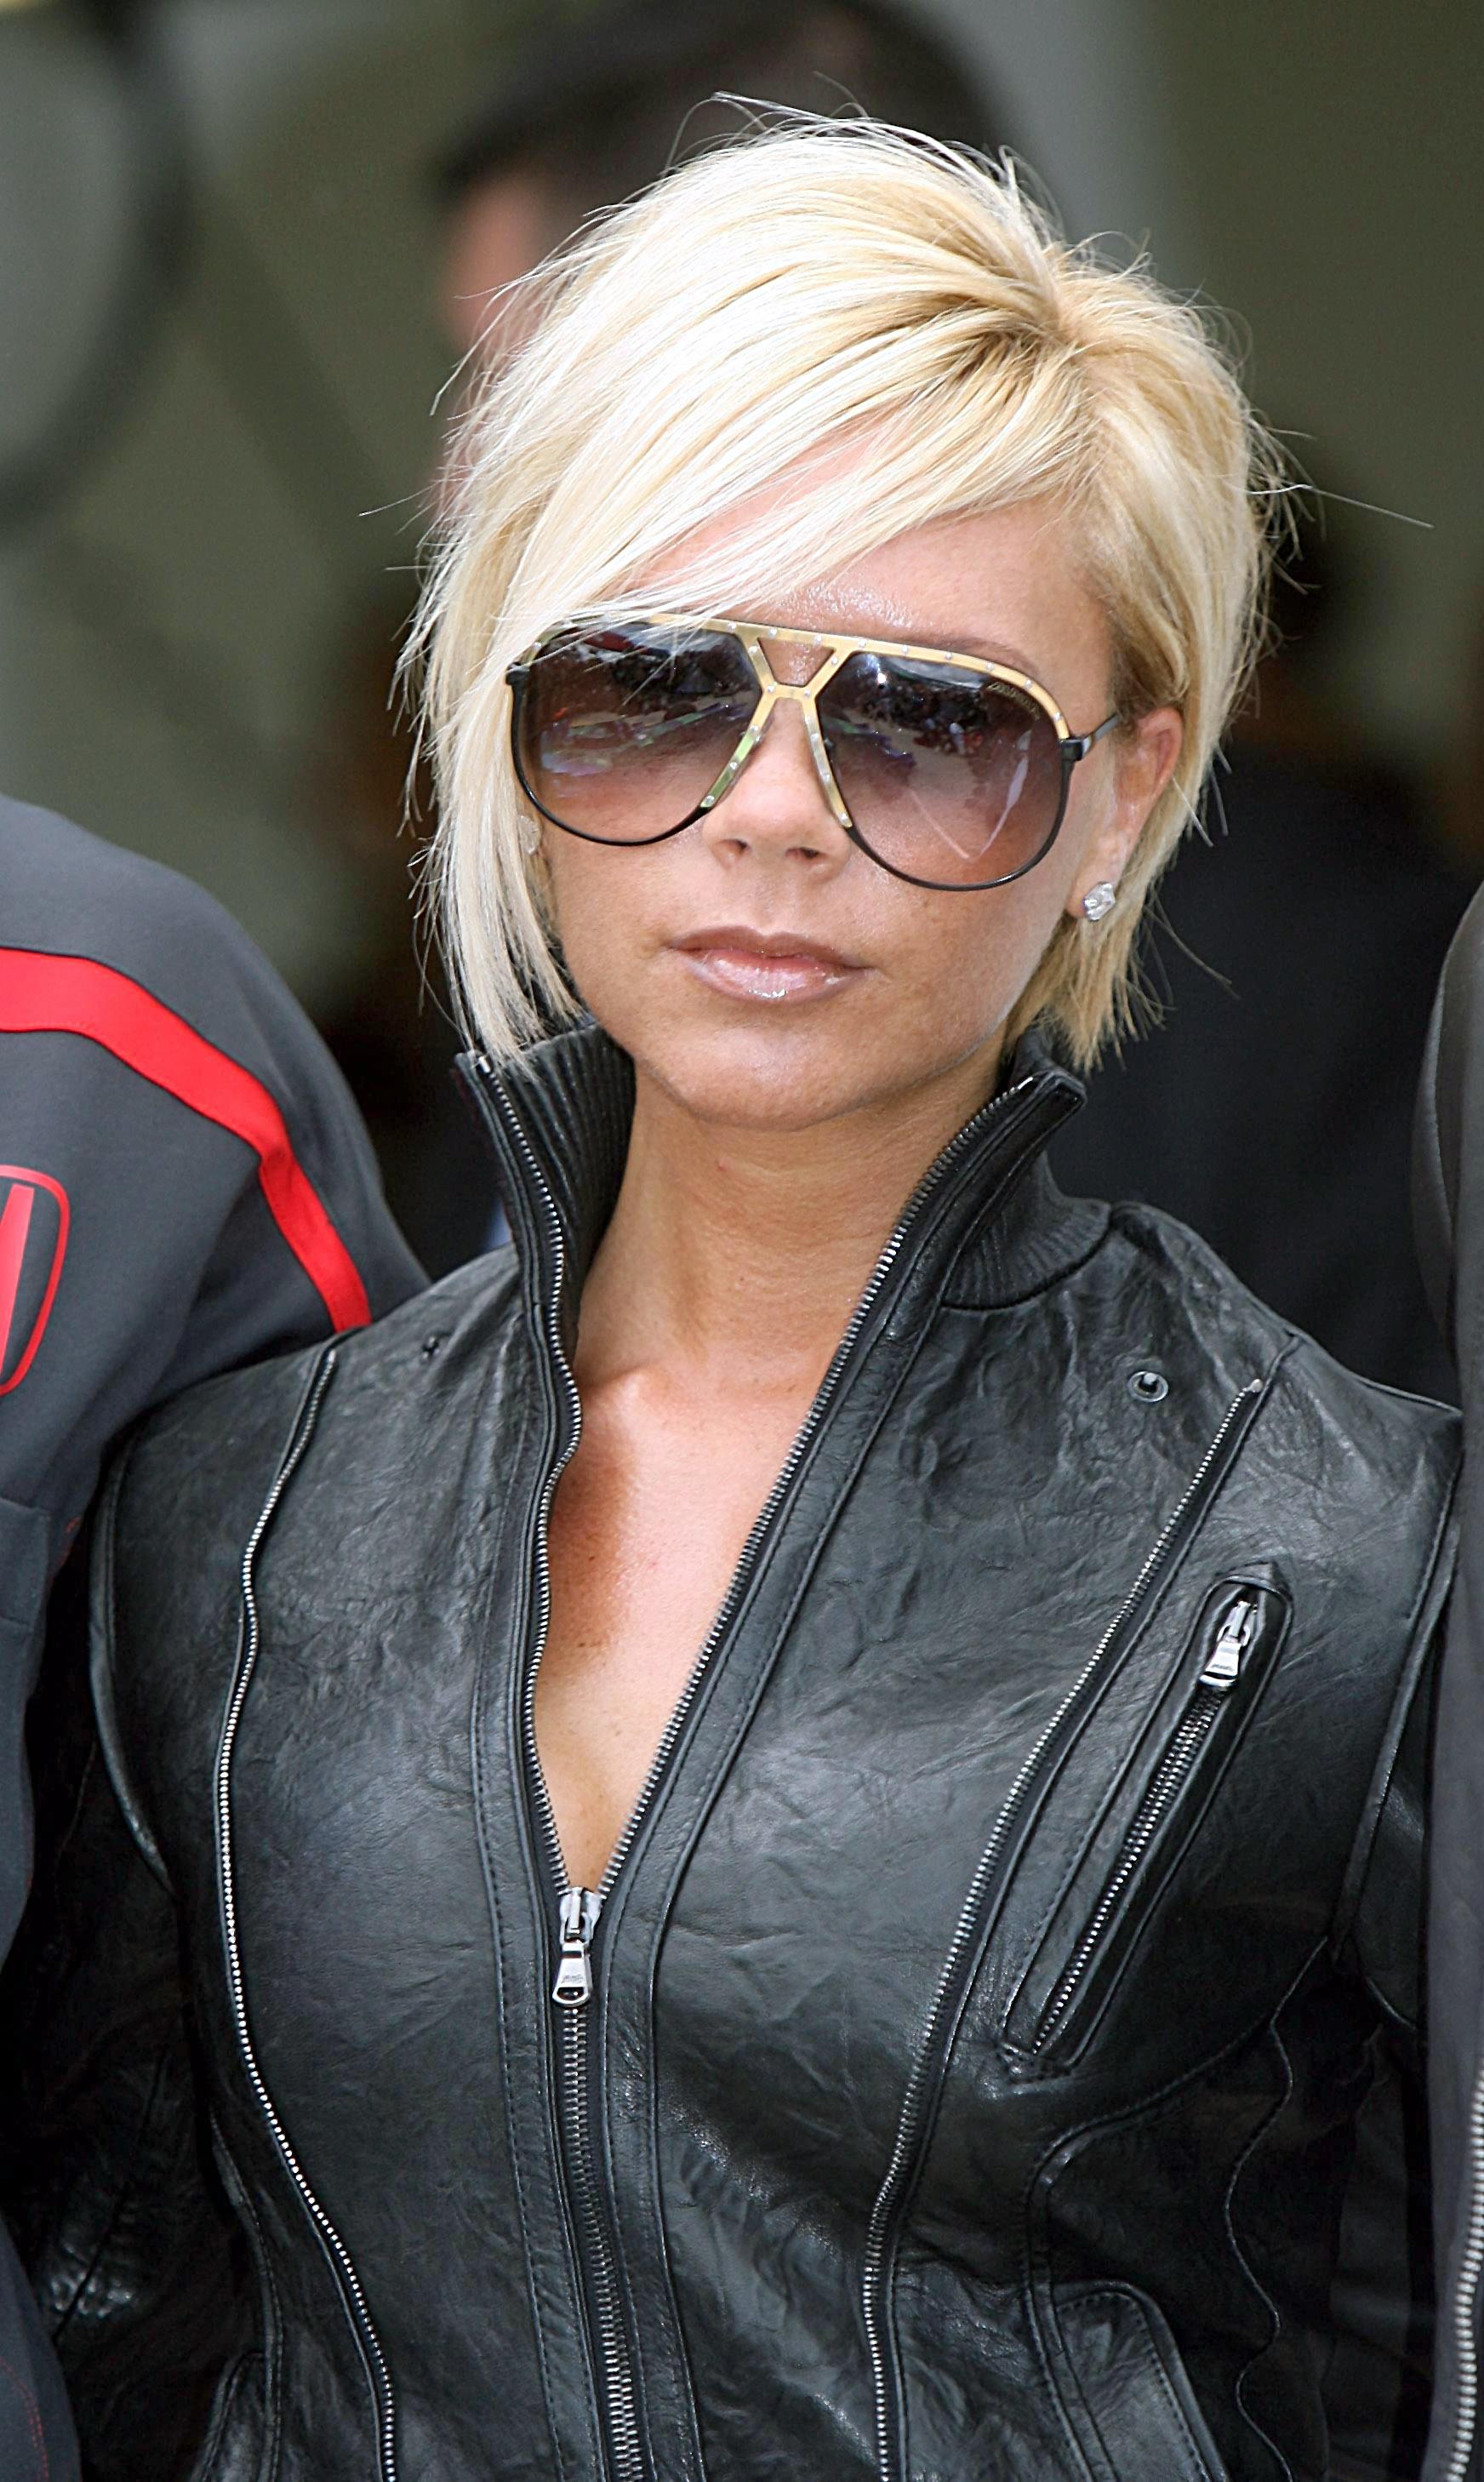 97411_celeb-city.eu_Victoria_Beckham_Formula_One_Grand_Prix_at_Silverstone_033_123_471lo.jpg